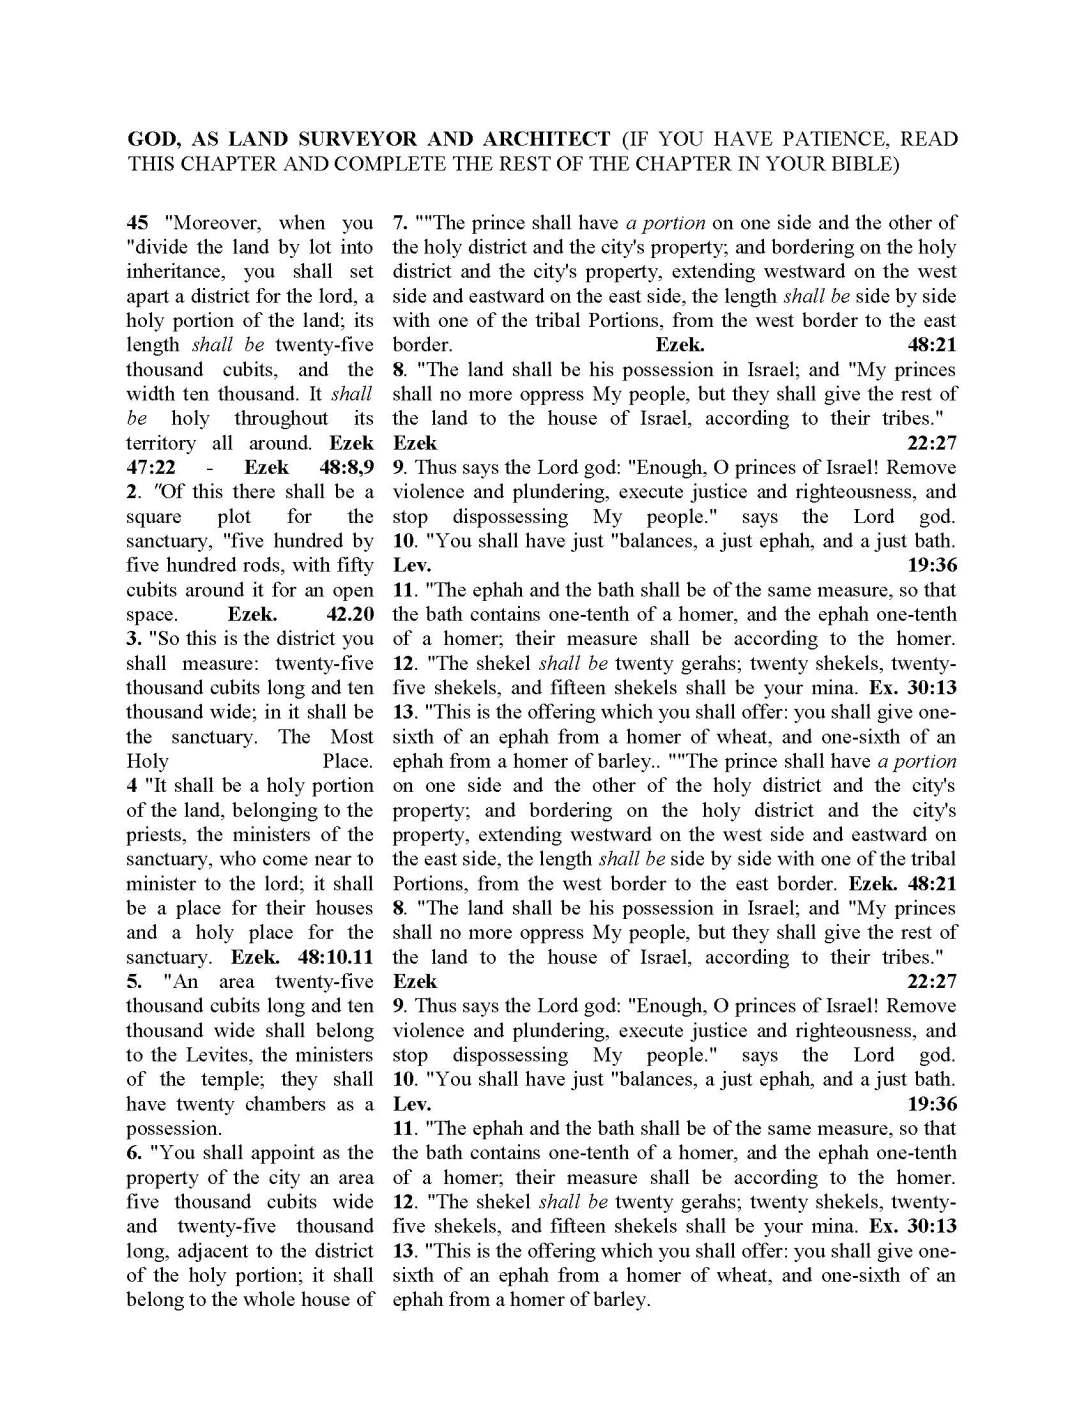 Is The Bible Gods Word [deedat]_Page_31